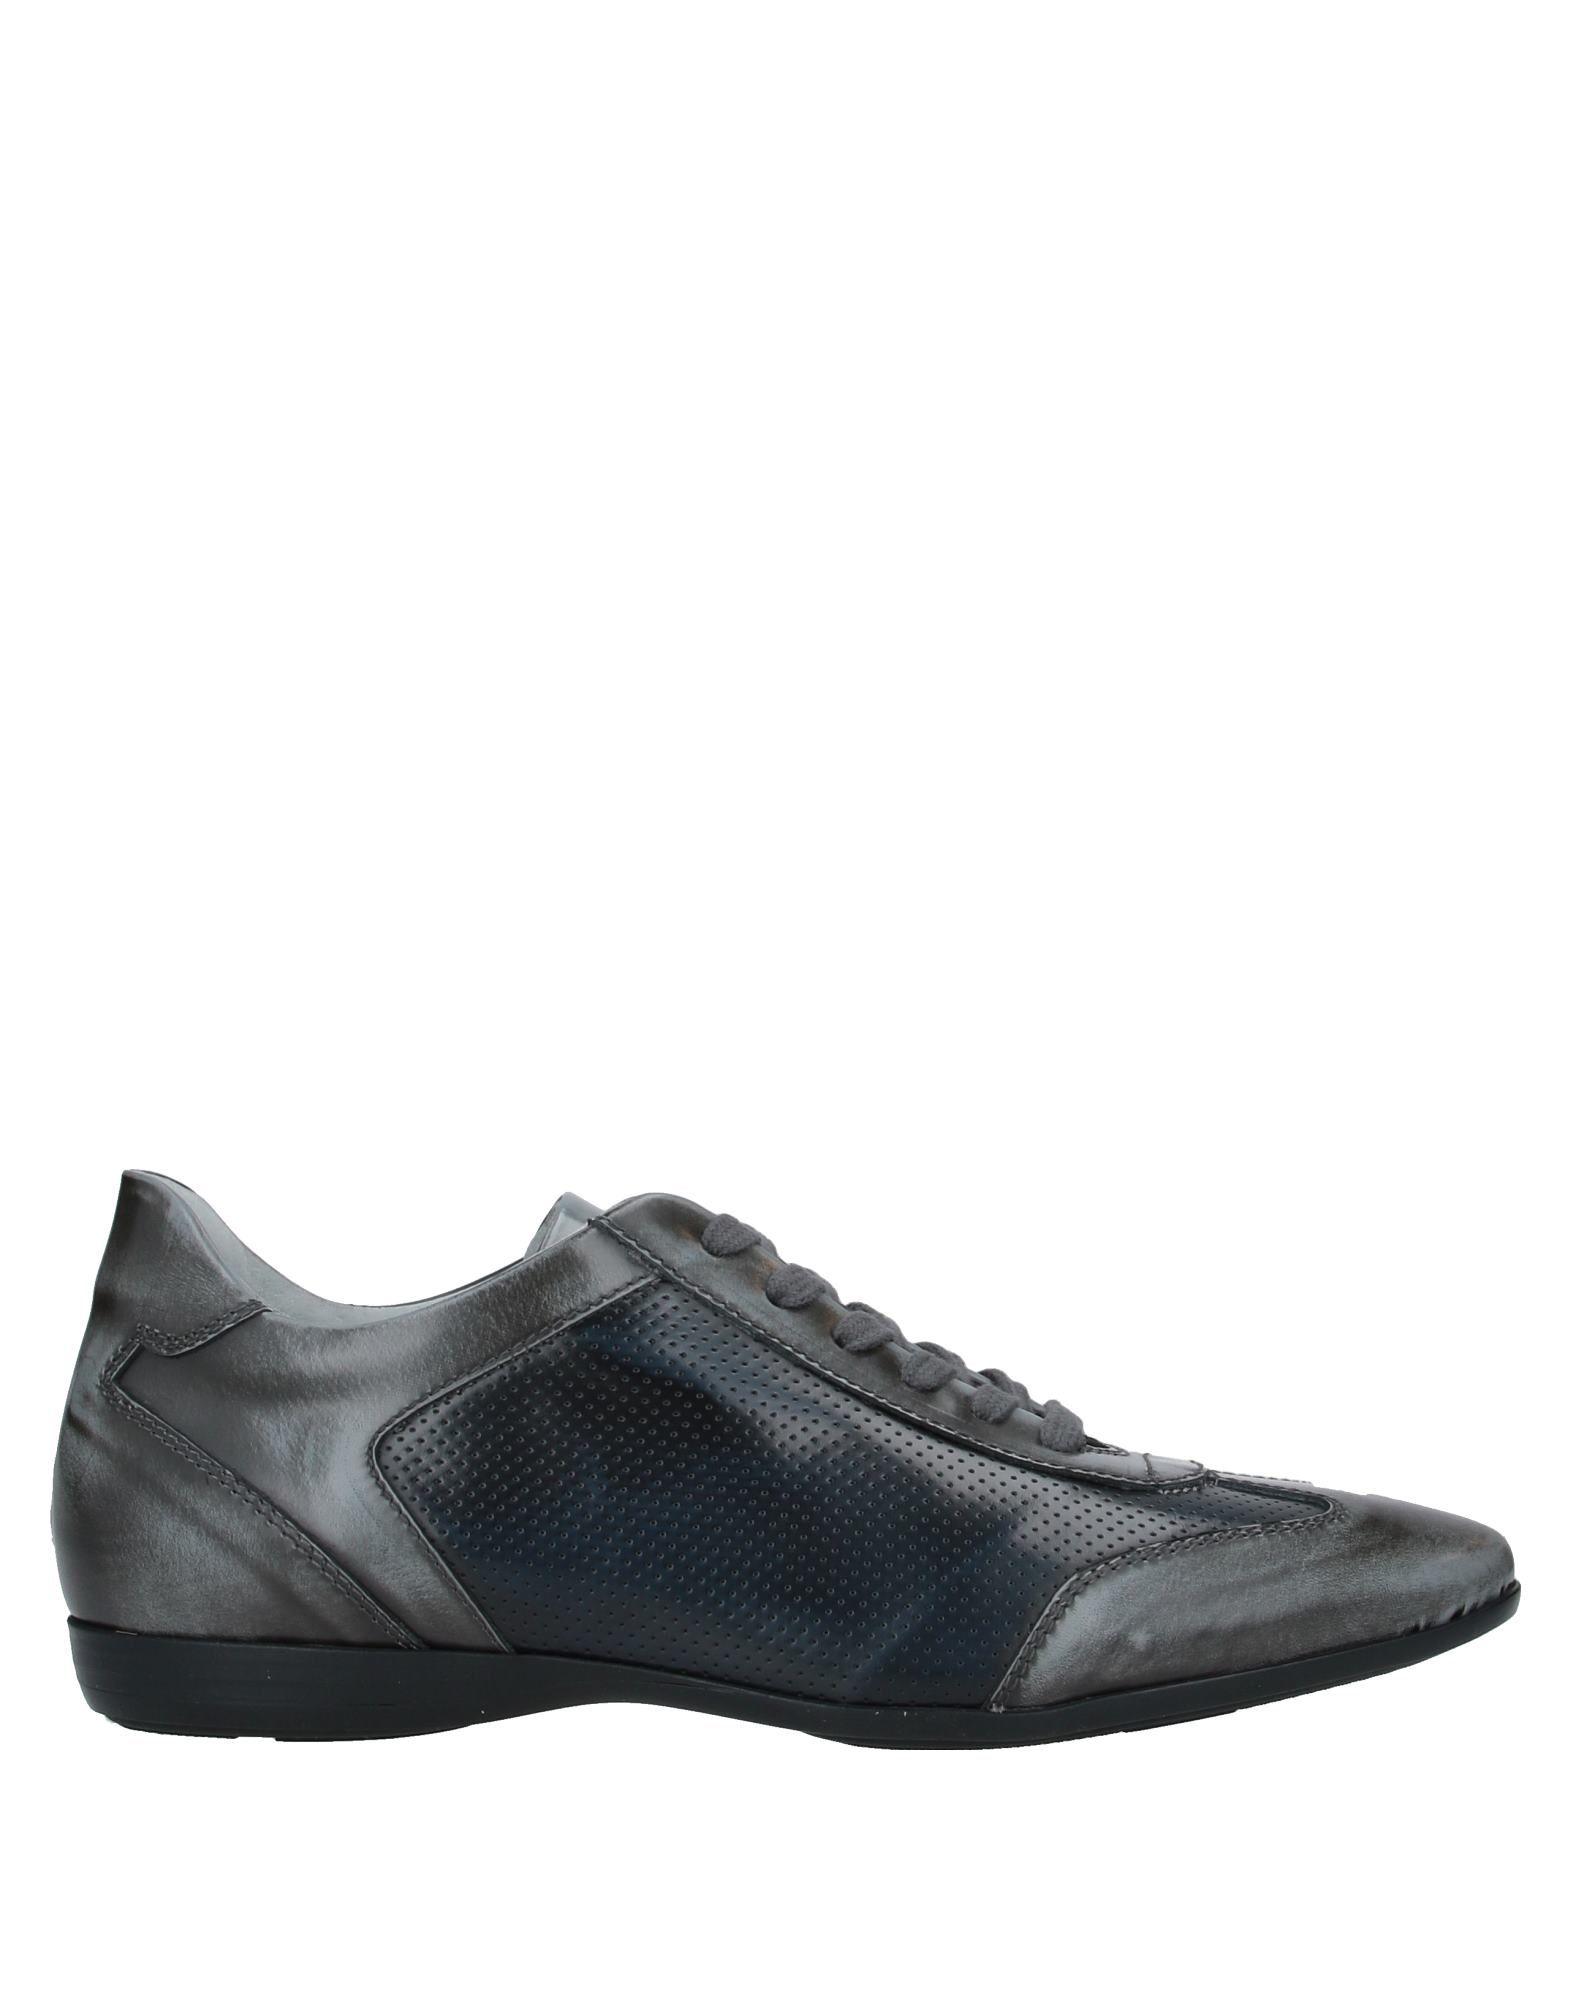 FABIANO RICCI Низкие кеды и кроссовки erika fabiano низкие кеды и кроссовки